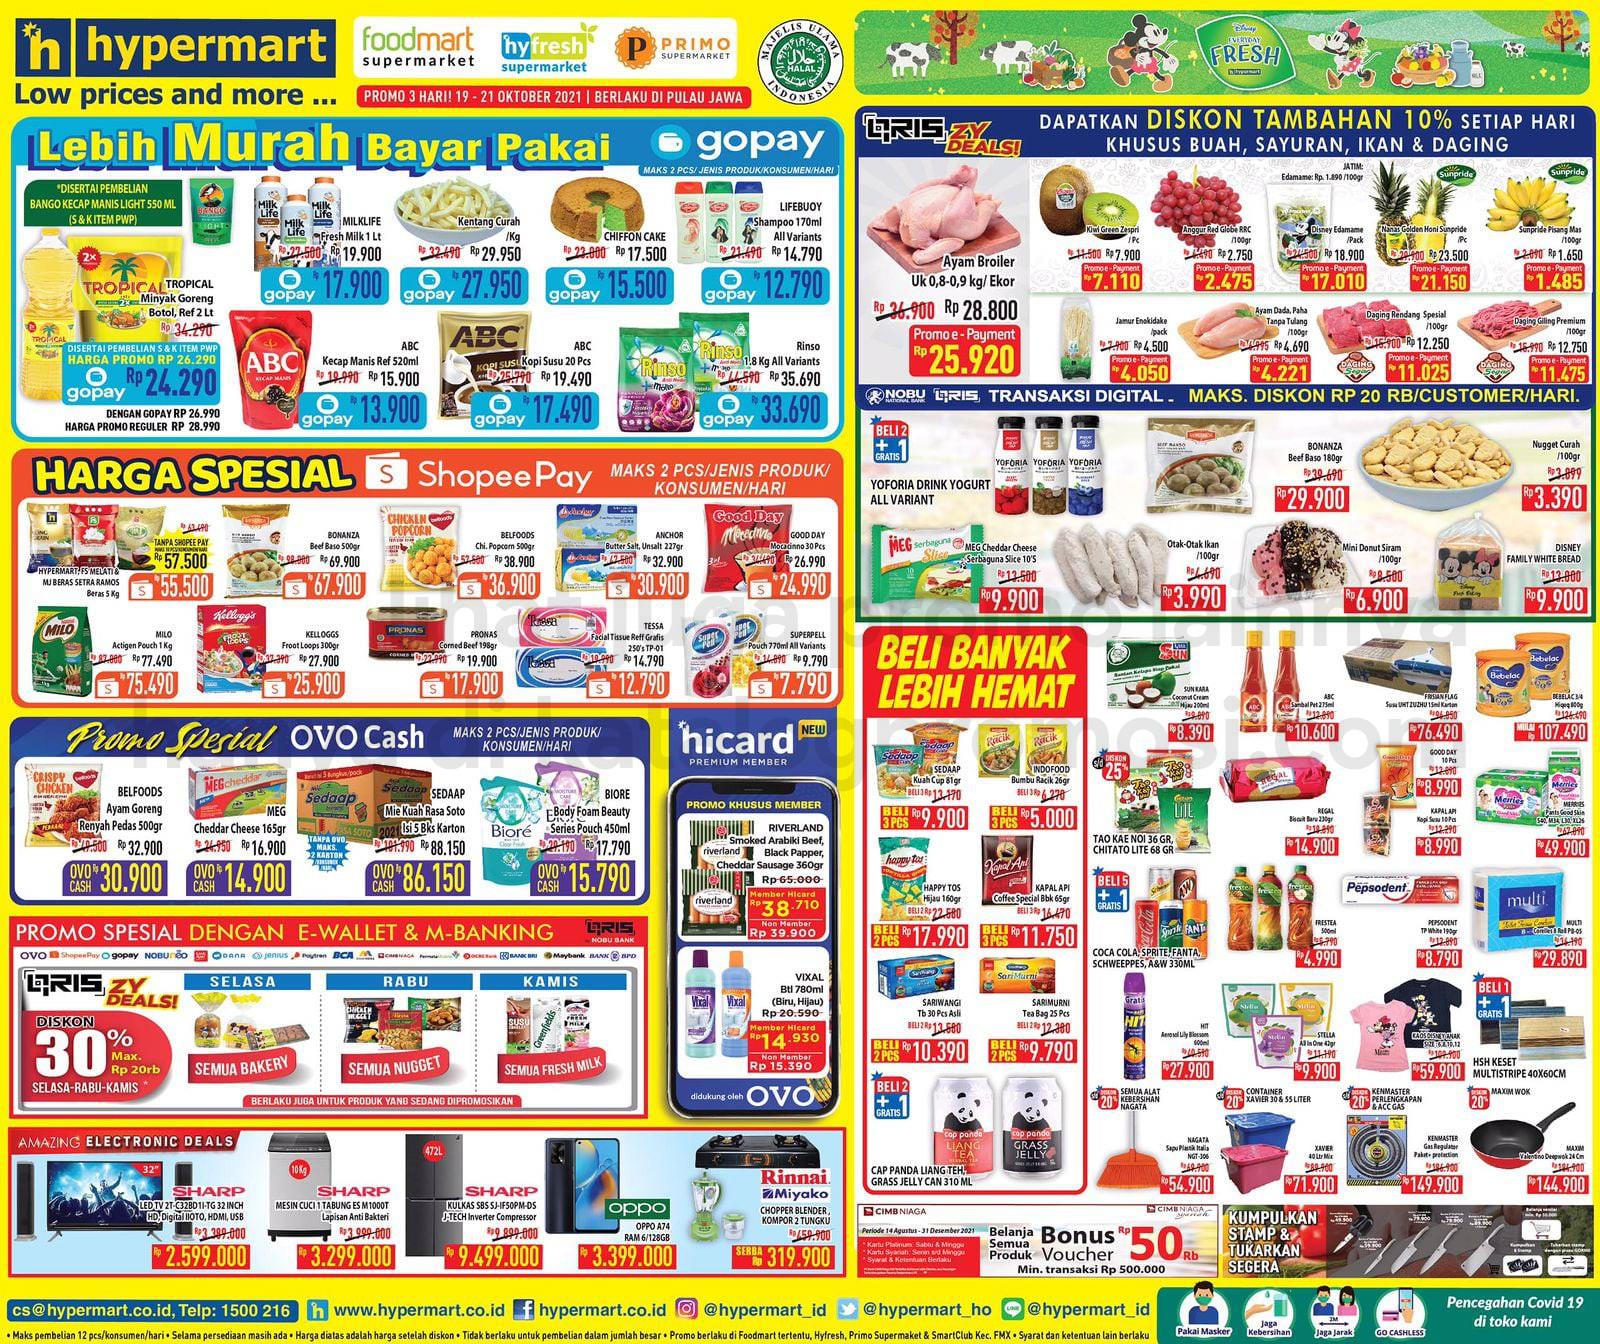 Katalog Hypermart Promo Weekday periode 19-21 Oktober 2021